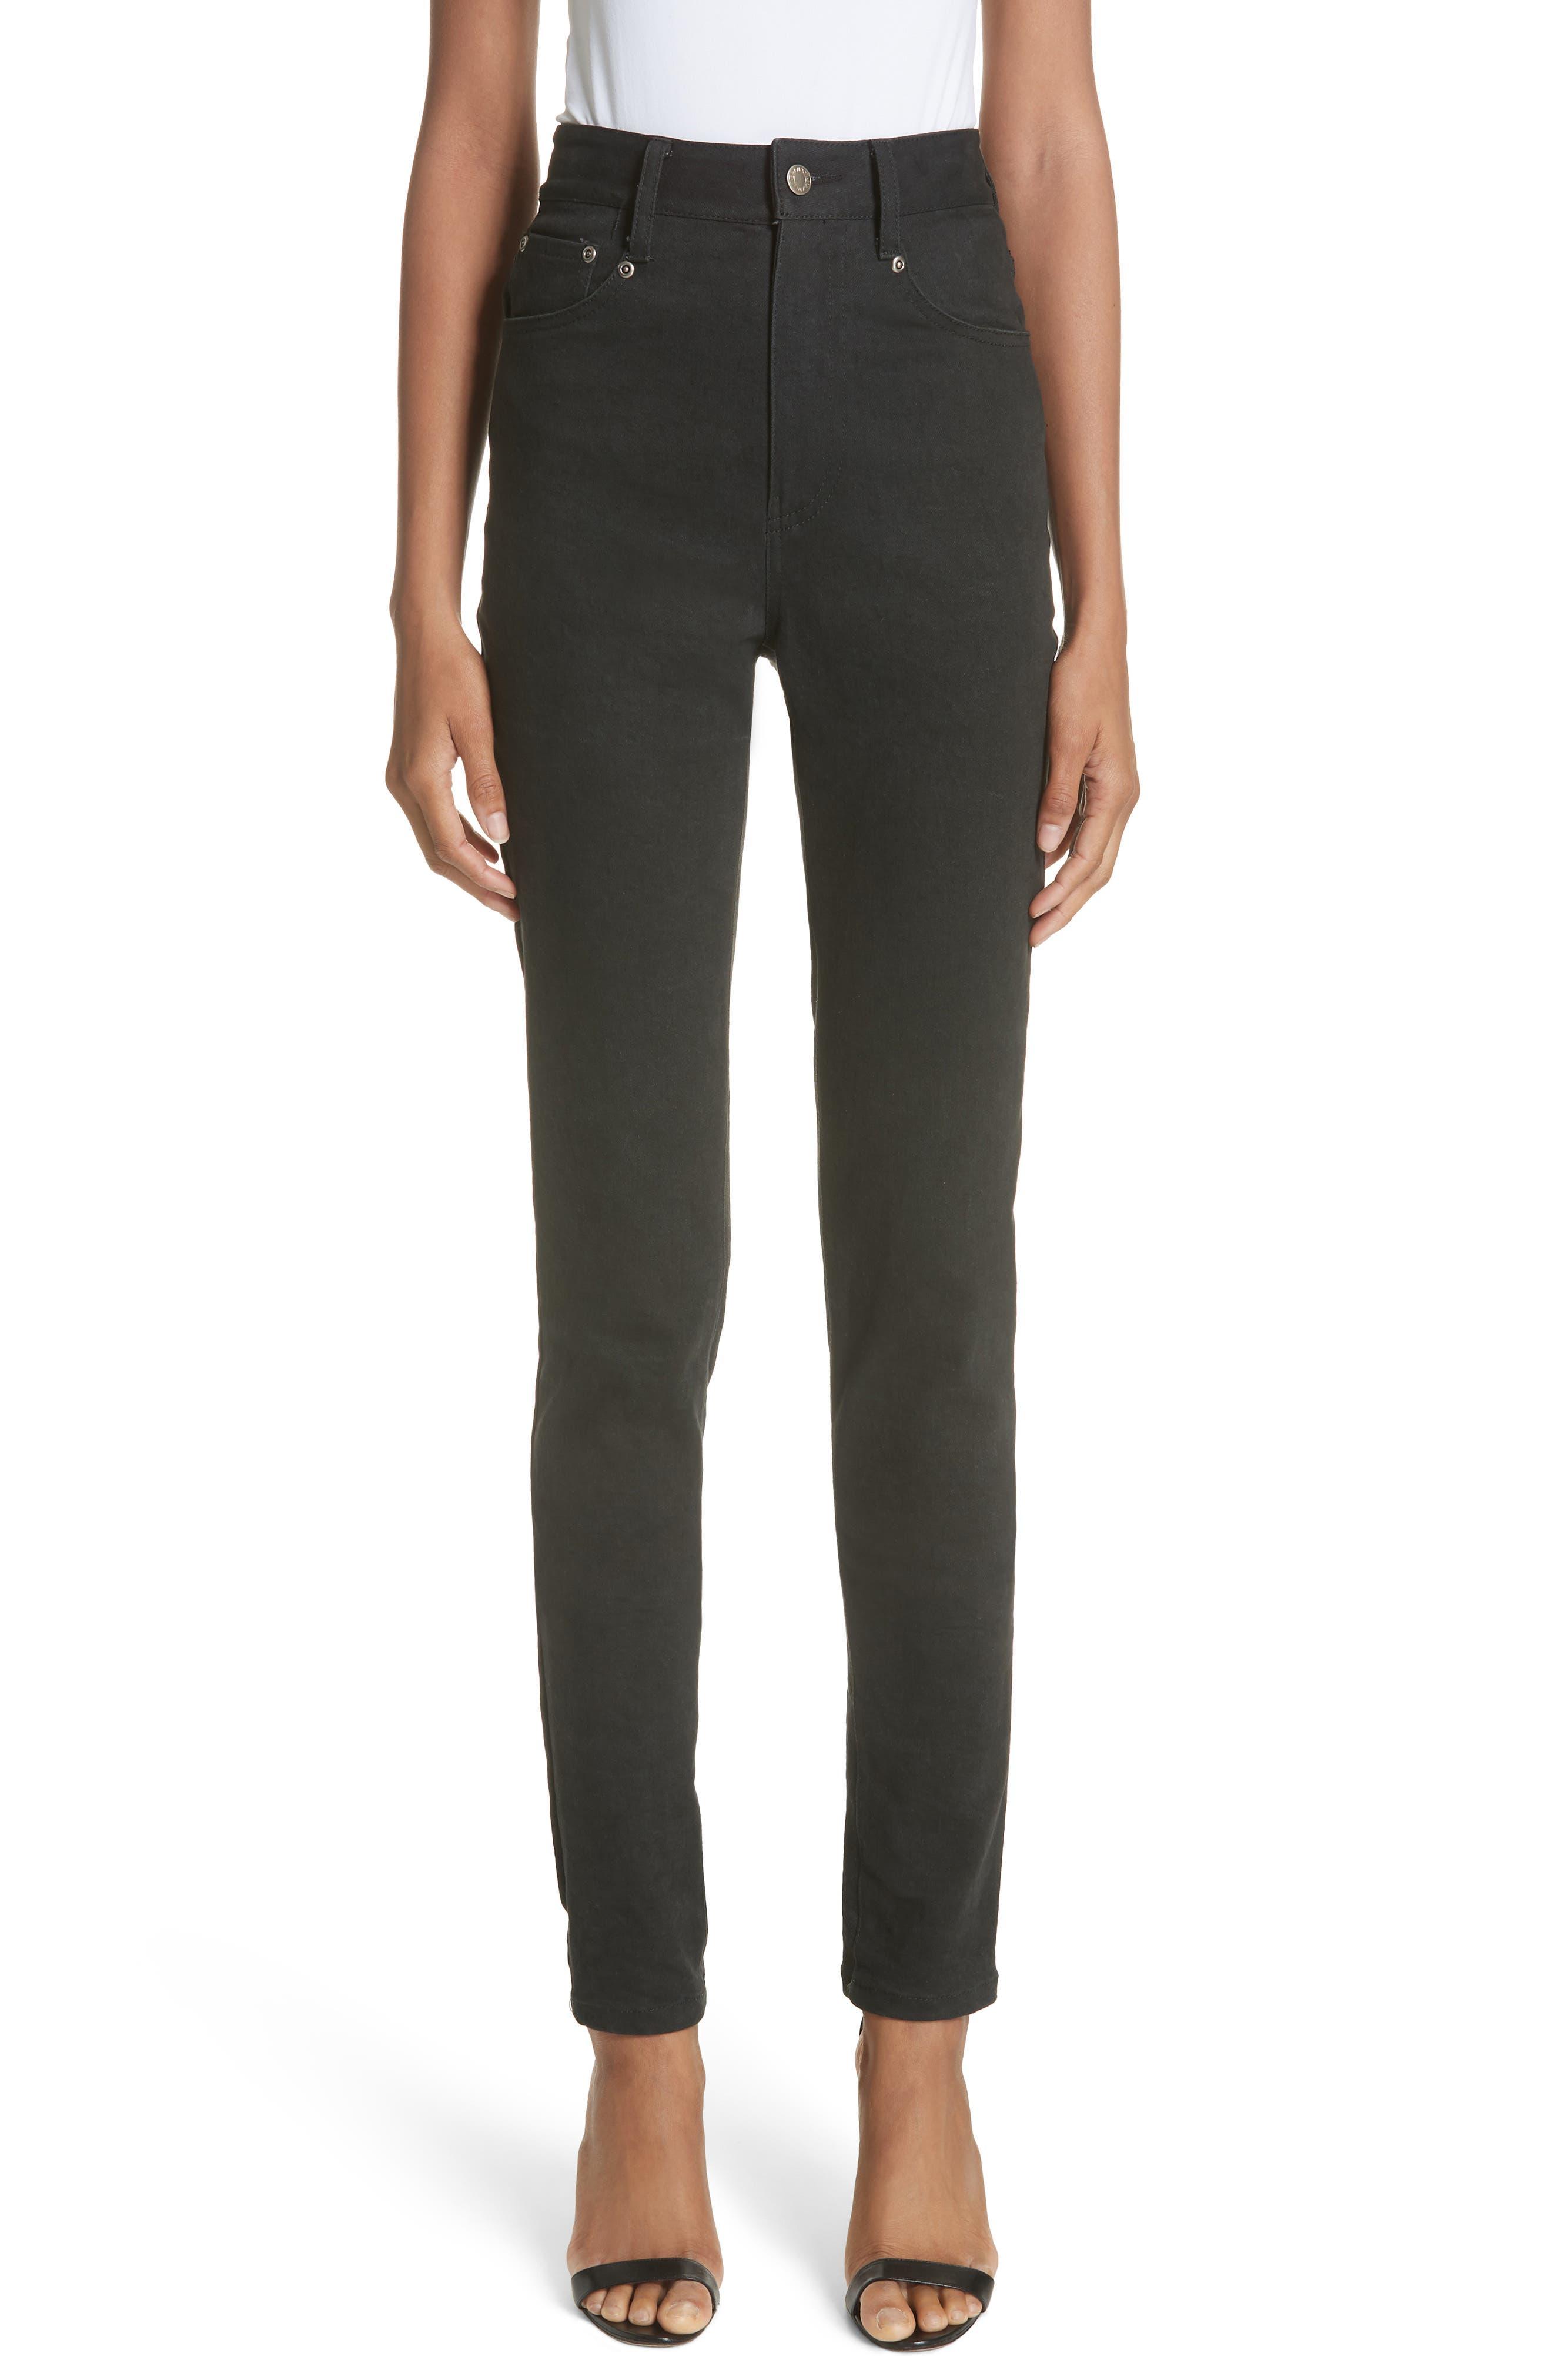 BRANDON MAXWELL High-Waist Skinny Jeans in Black